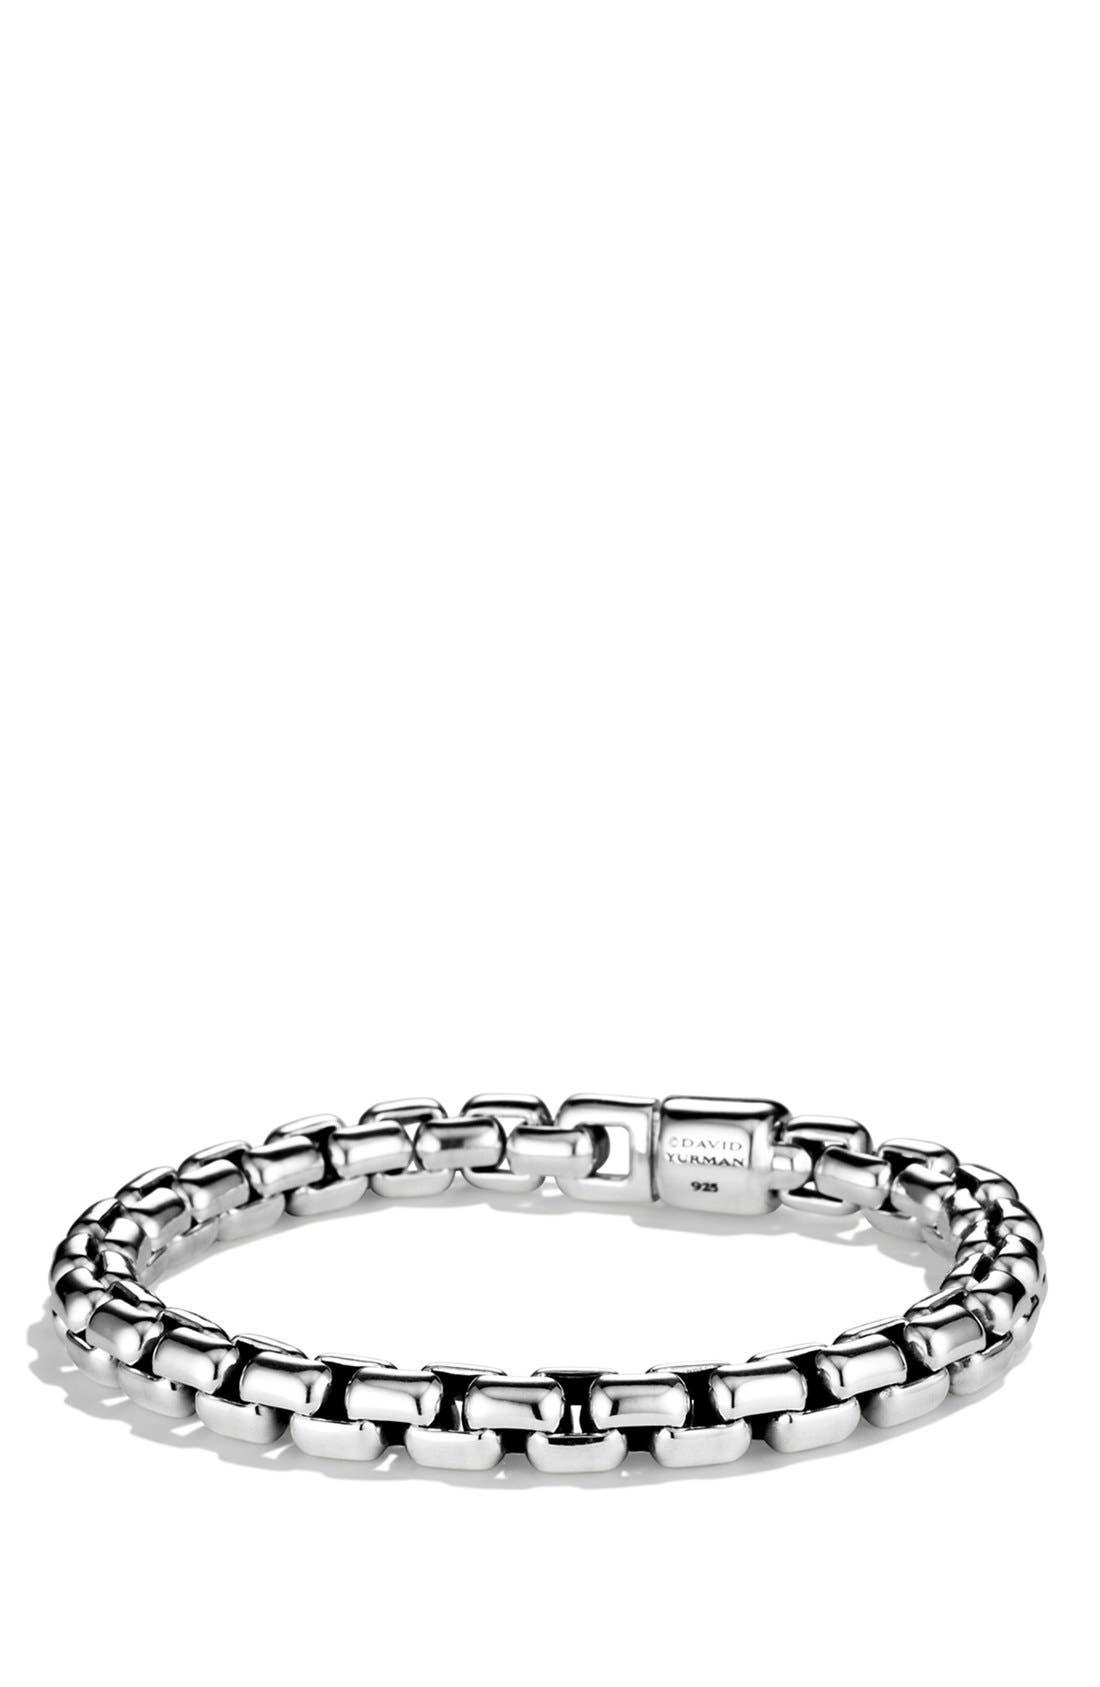 Main Image - David Yurman 'Chain' Box Chain Bracelet